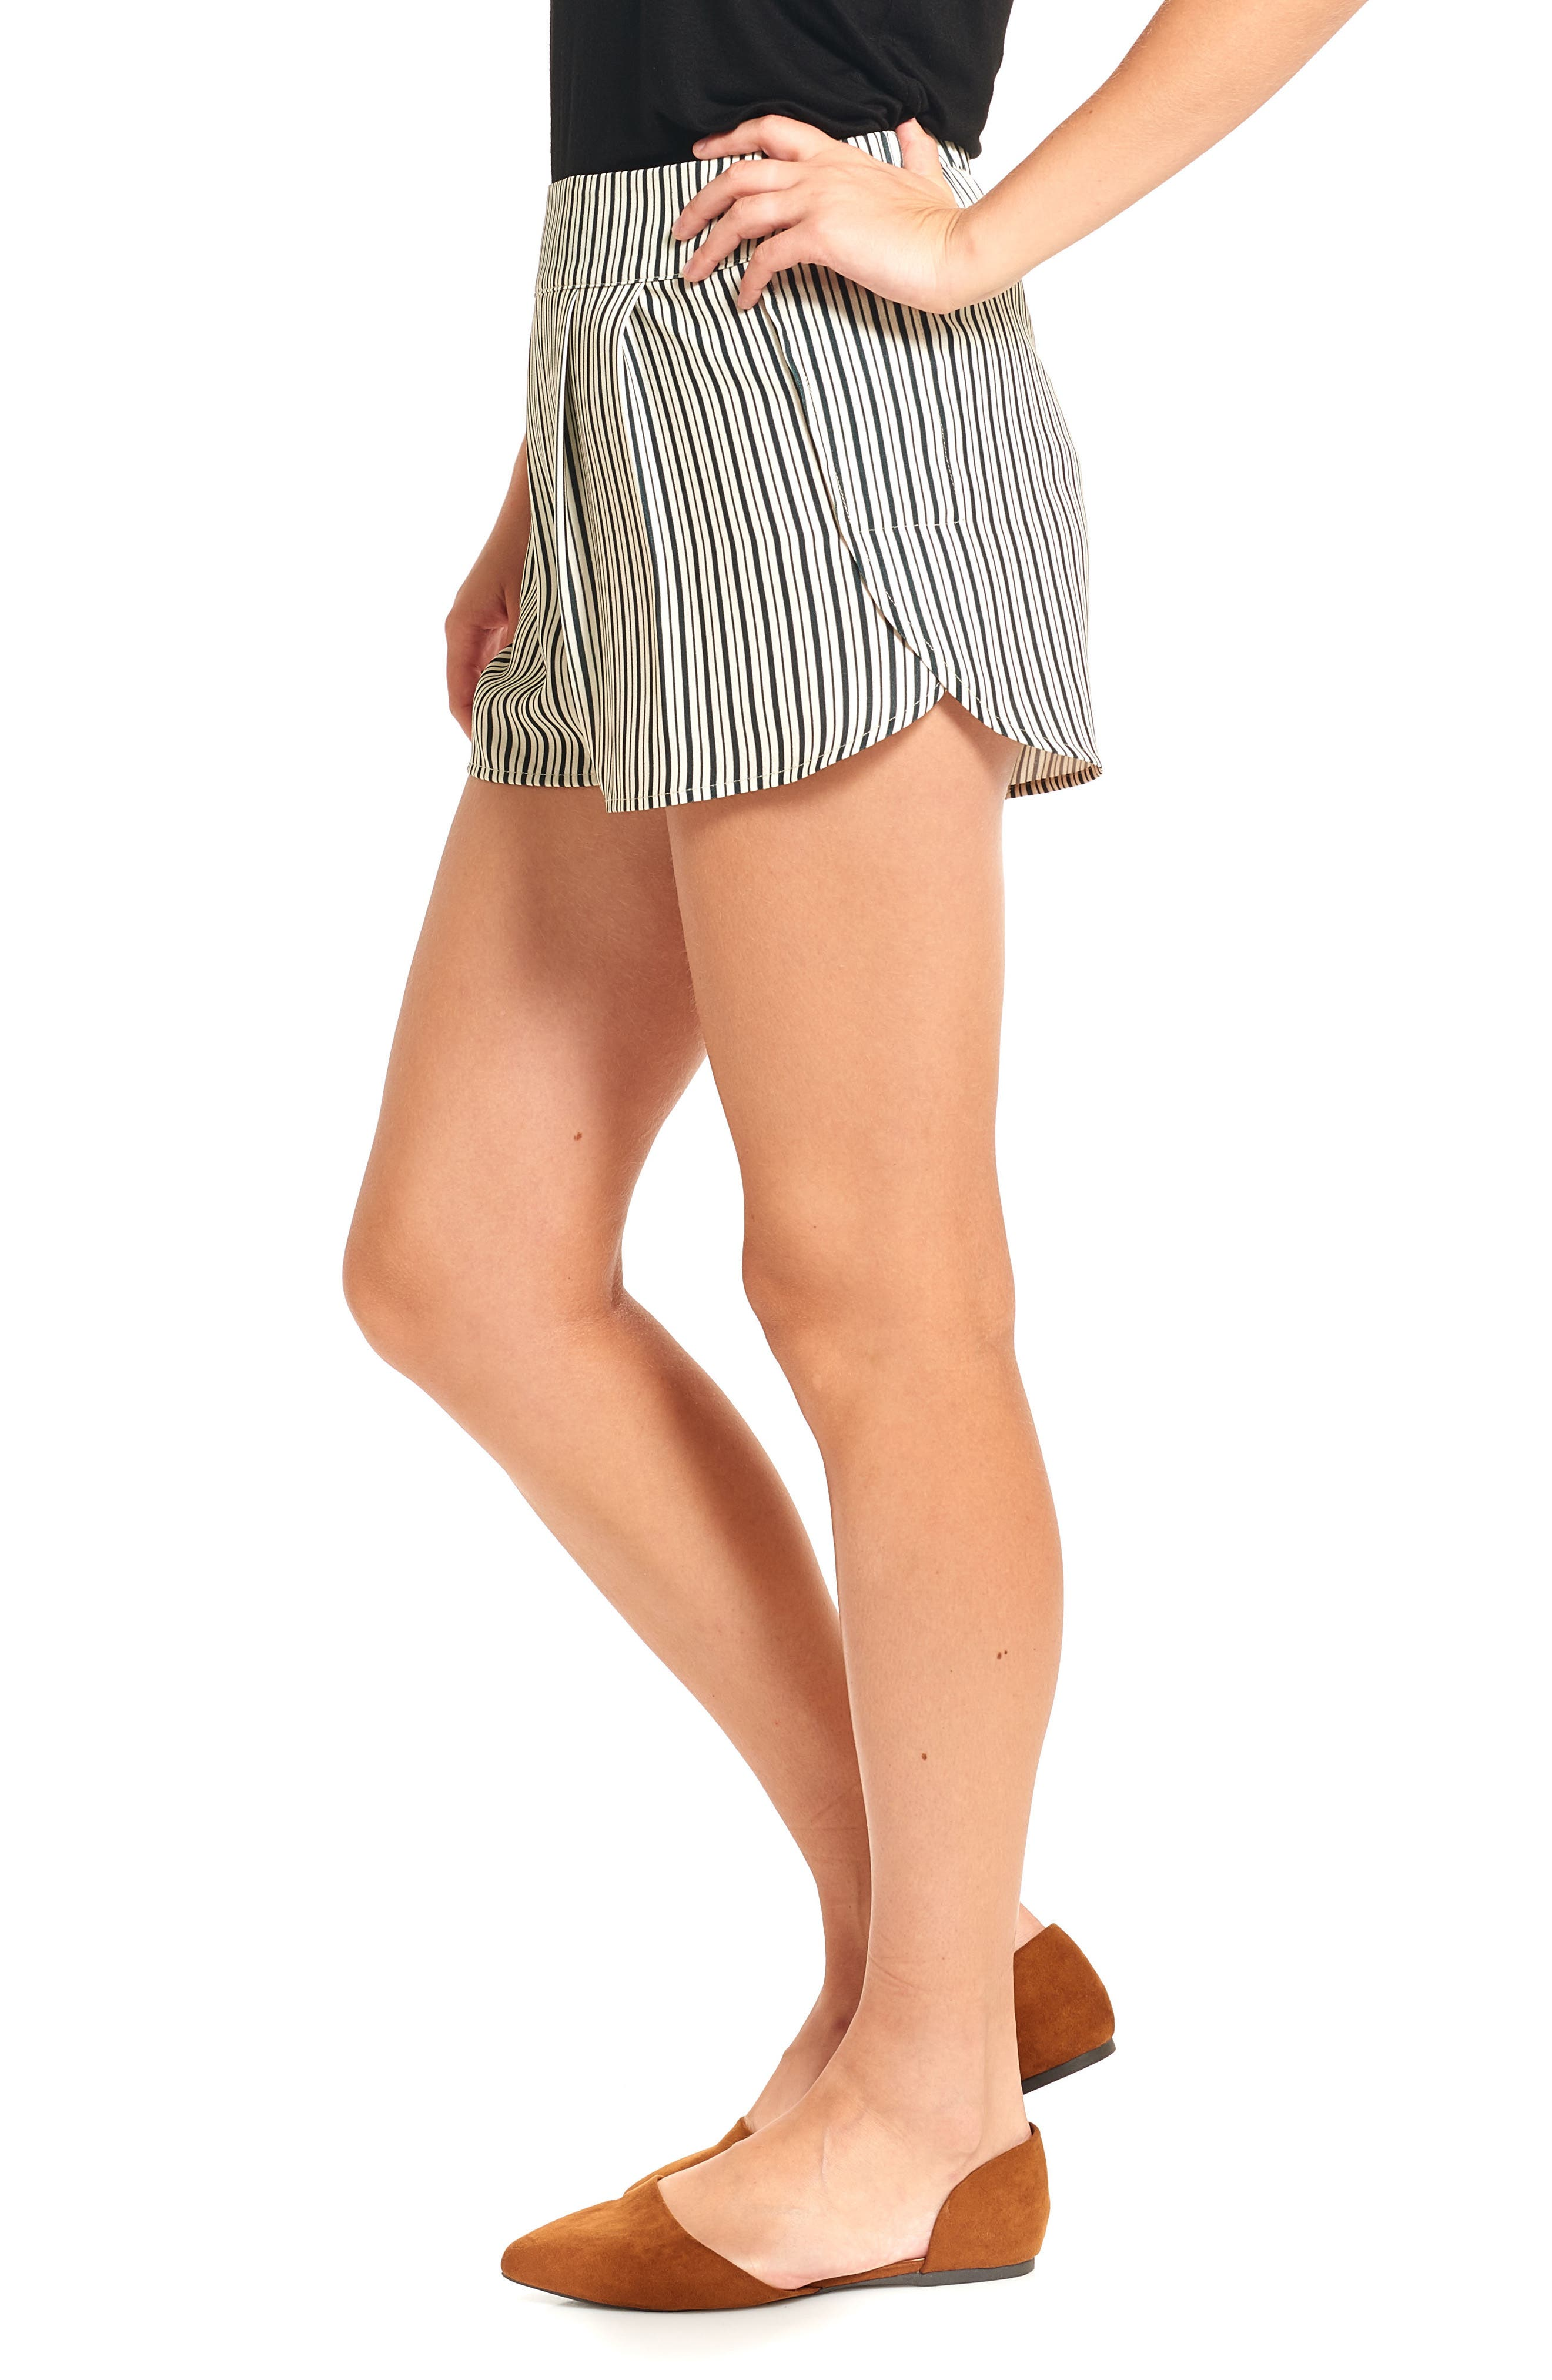 THIEVES LIKE US,                             Stripe Running Shorts,                             Alternate thumbnail 3, color,                             001